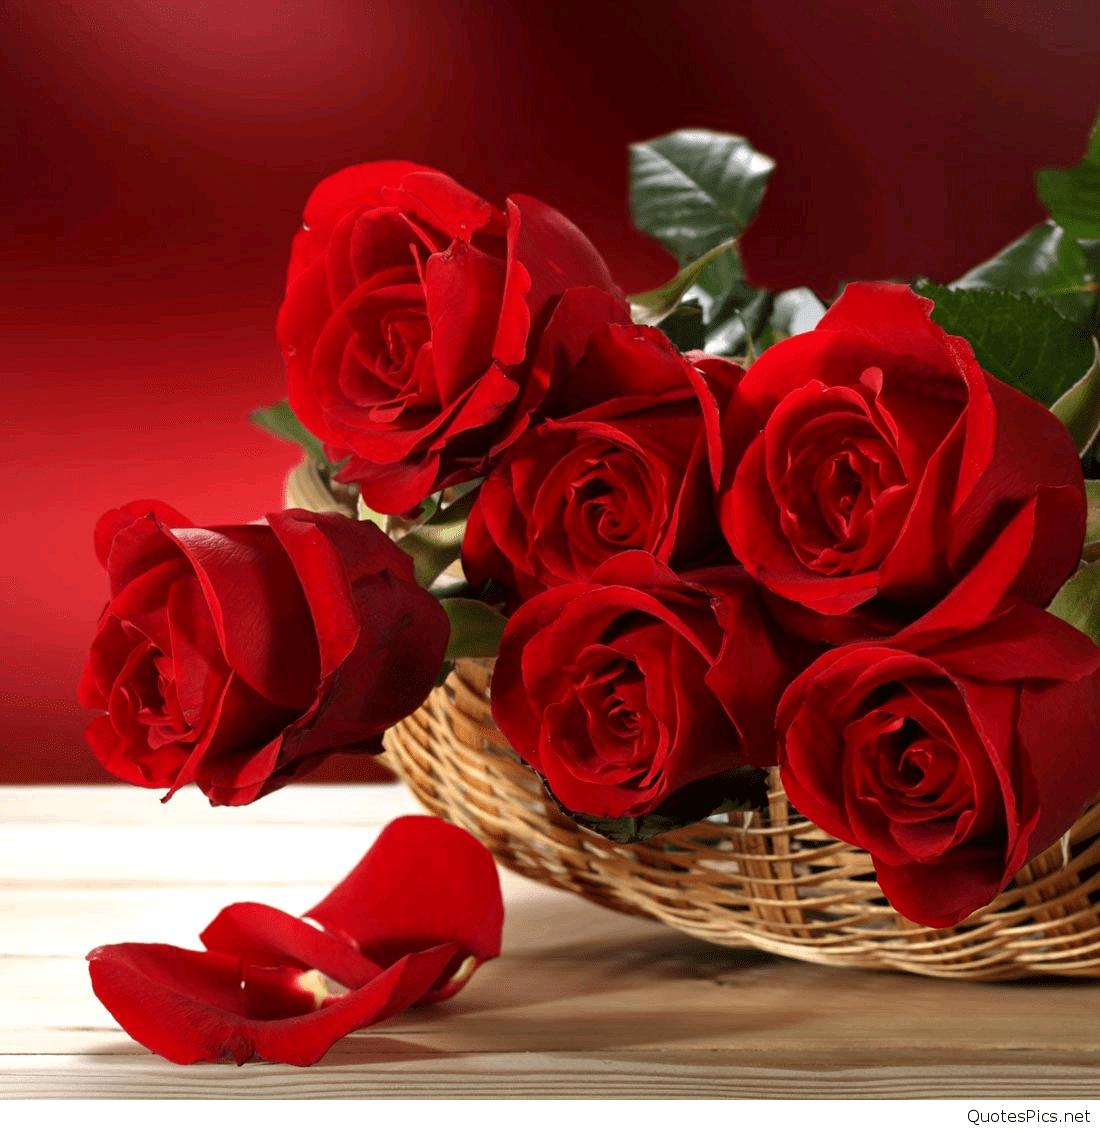 Love Rose Wallpaper 1100x1130 Download Hd Wallpaper Wallpapertip